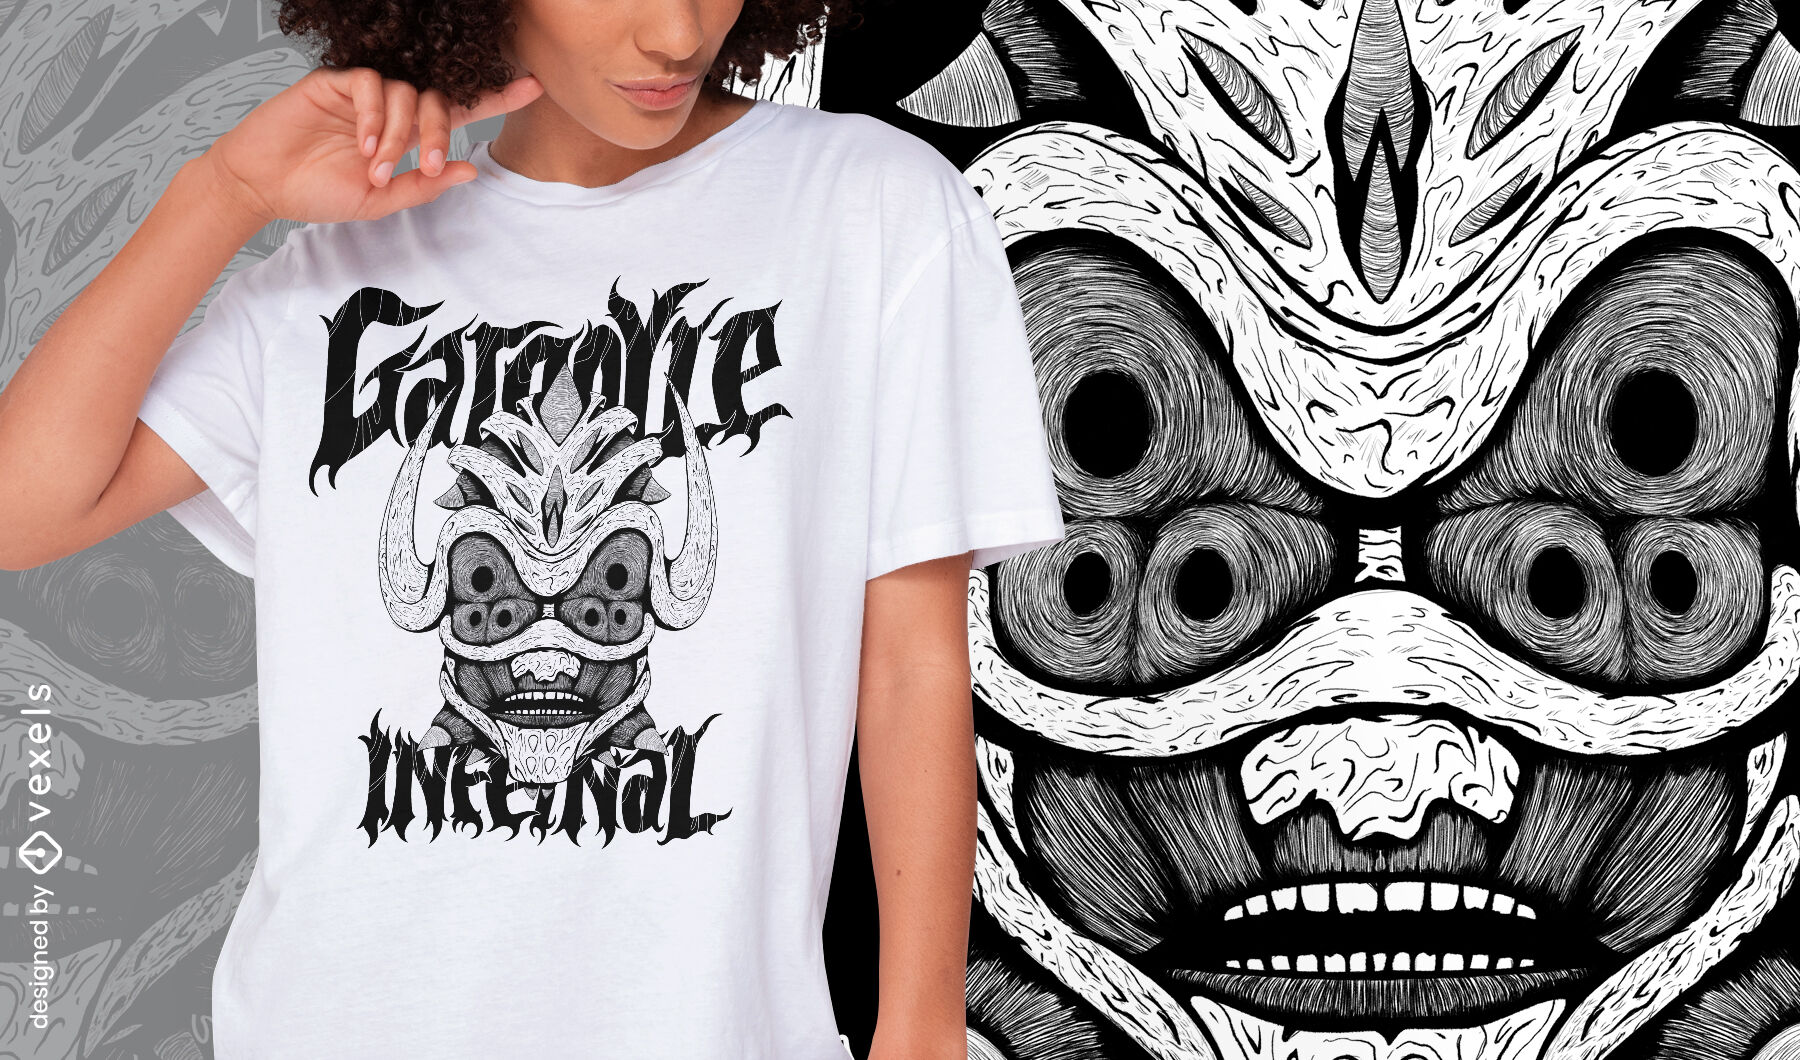 Camiseta dibujada a mano monstruo g?rgola diablo psd